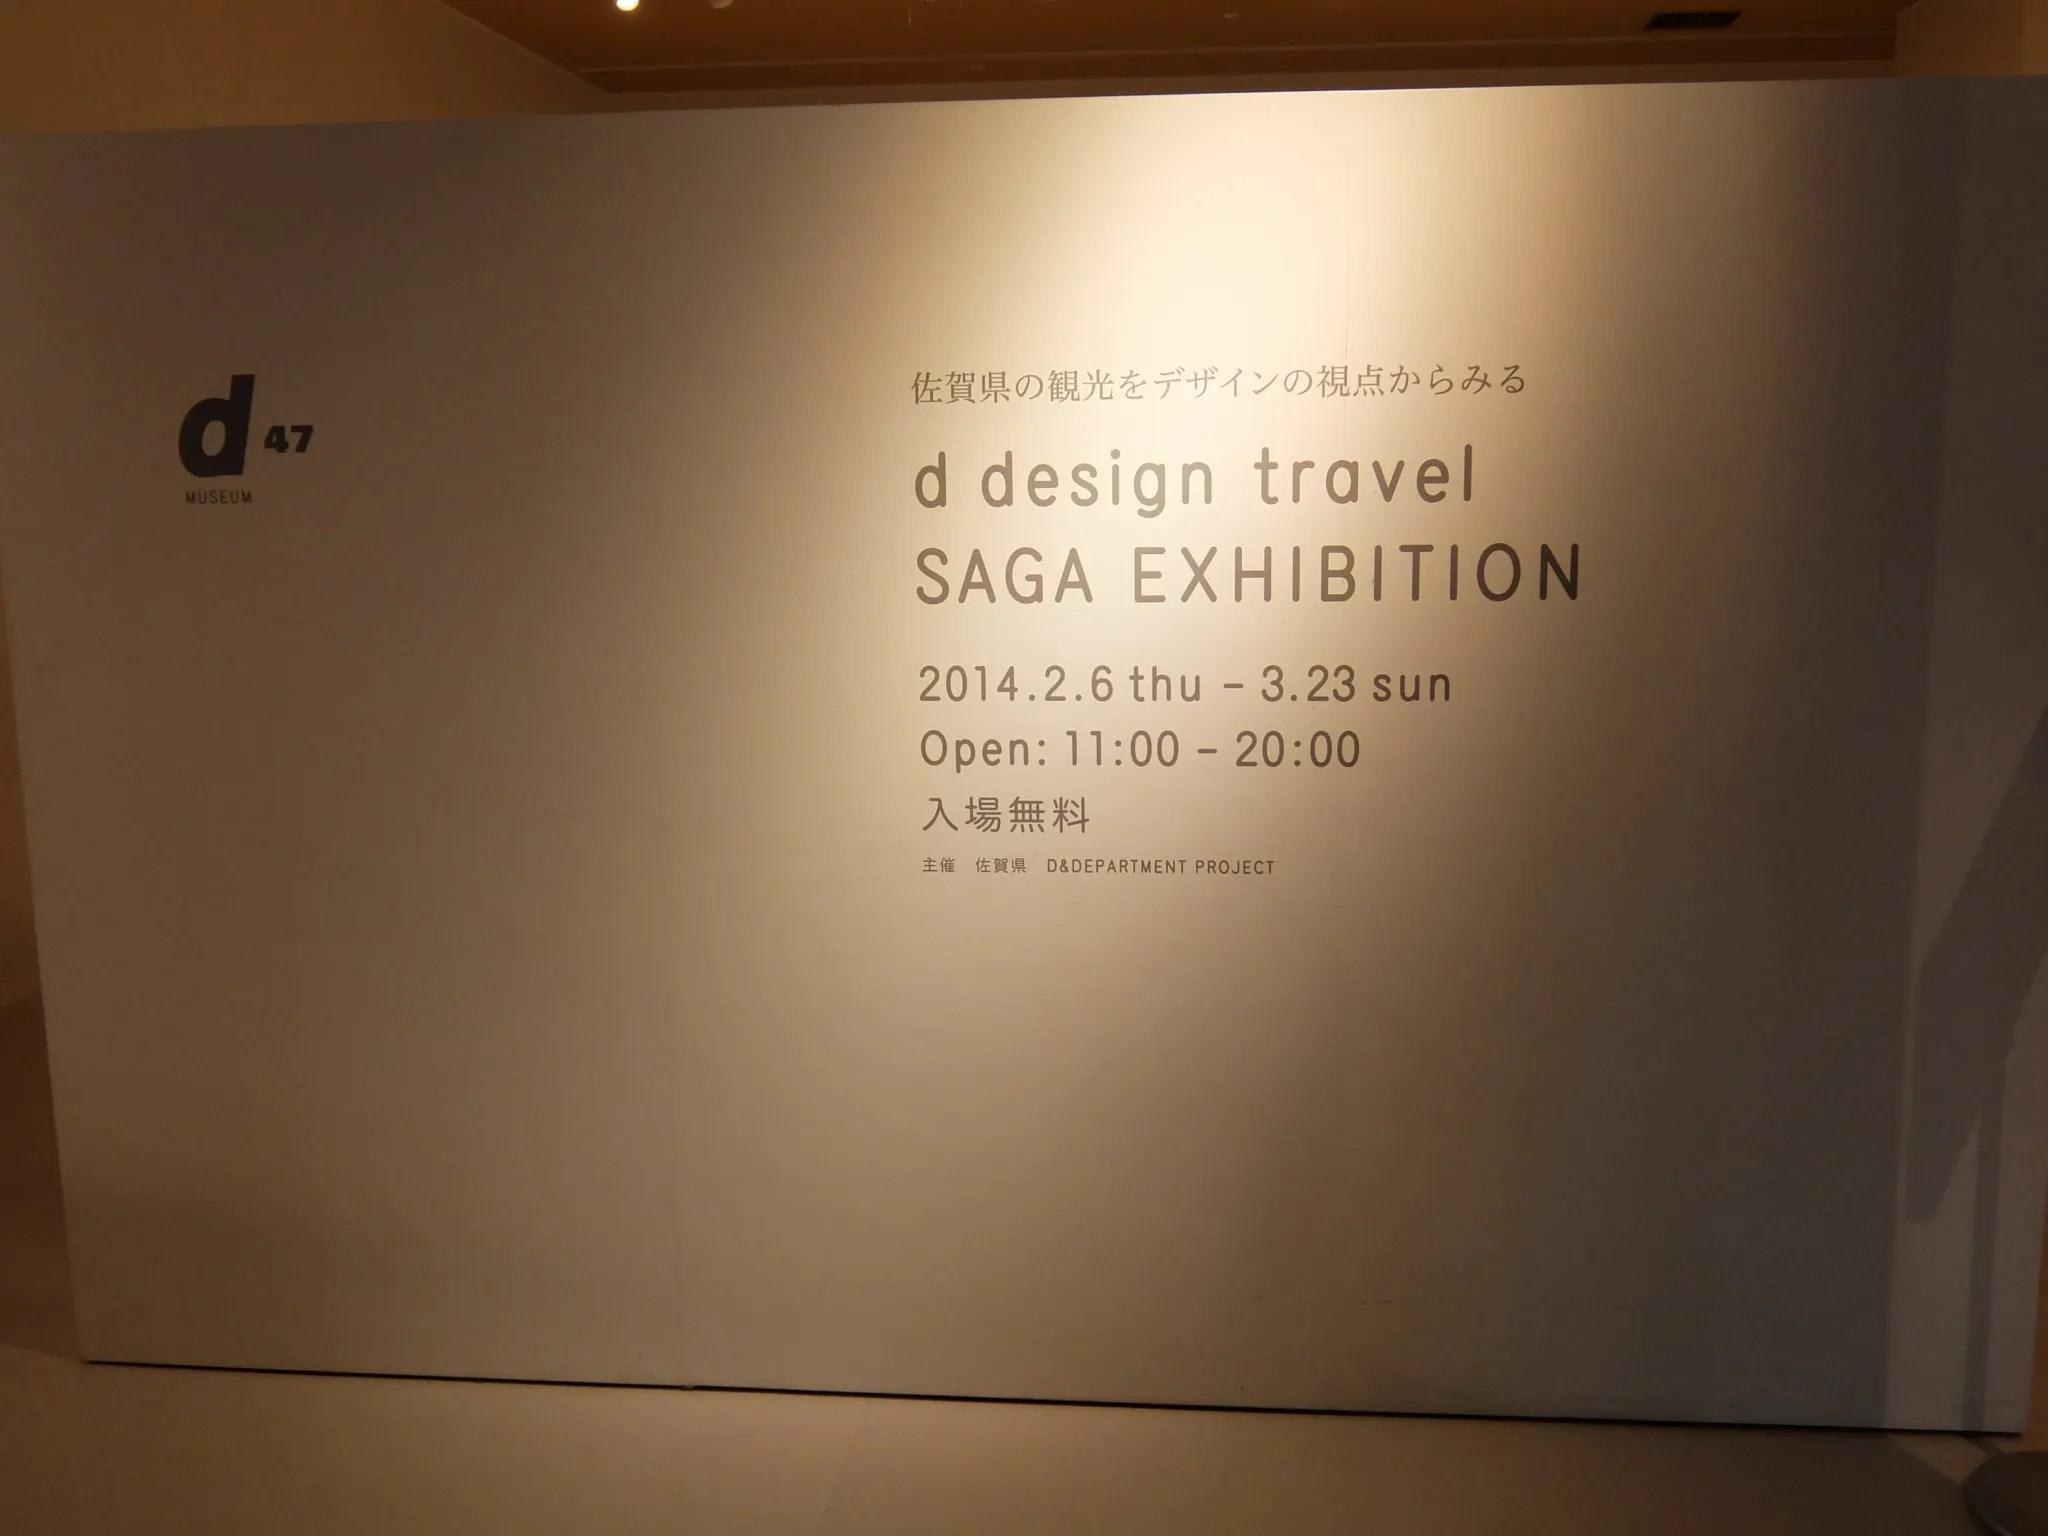 d design travel SAGA EXHIBITION